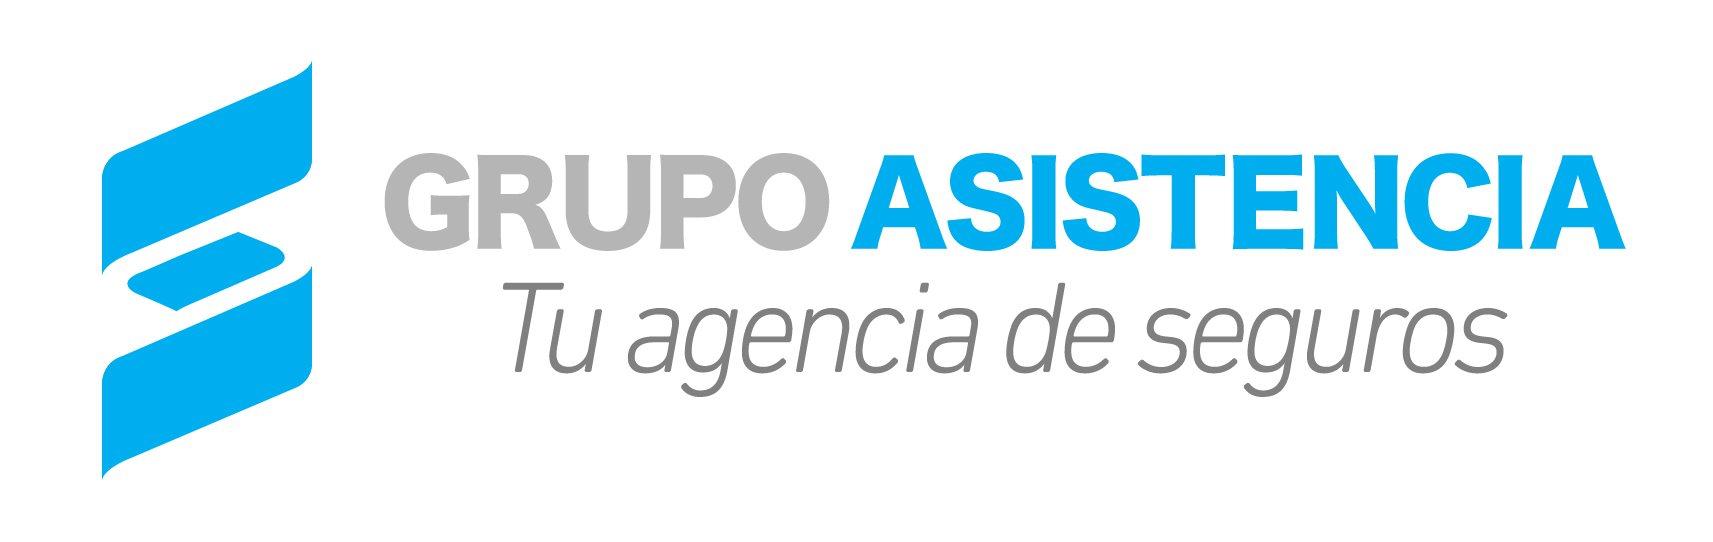 SEGUROS GRUPO ASISTENCIA LTDA